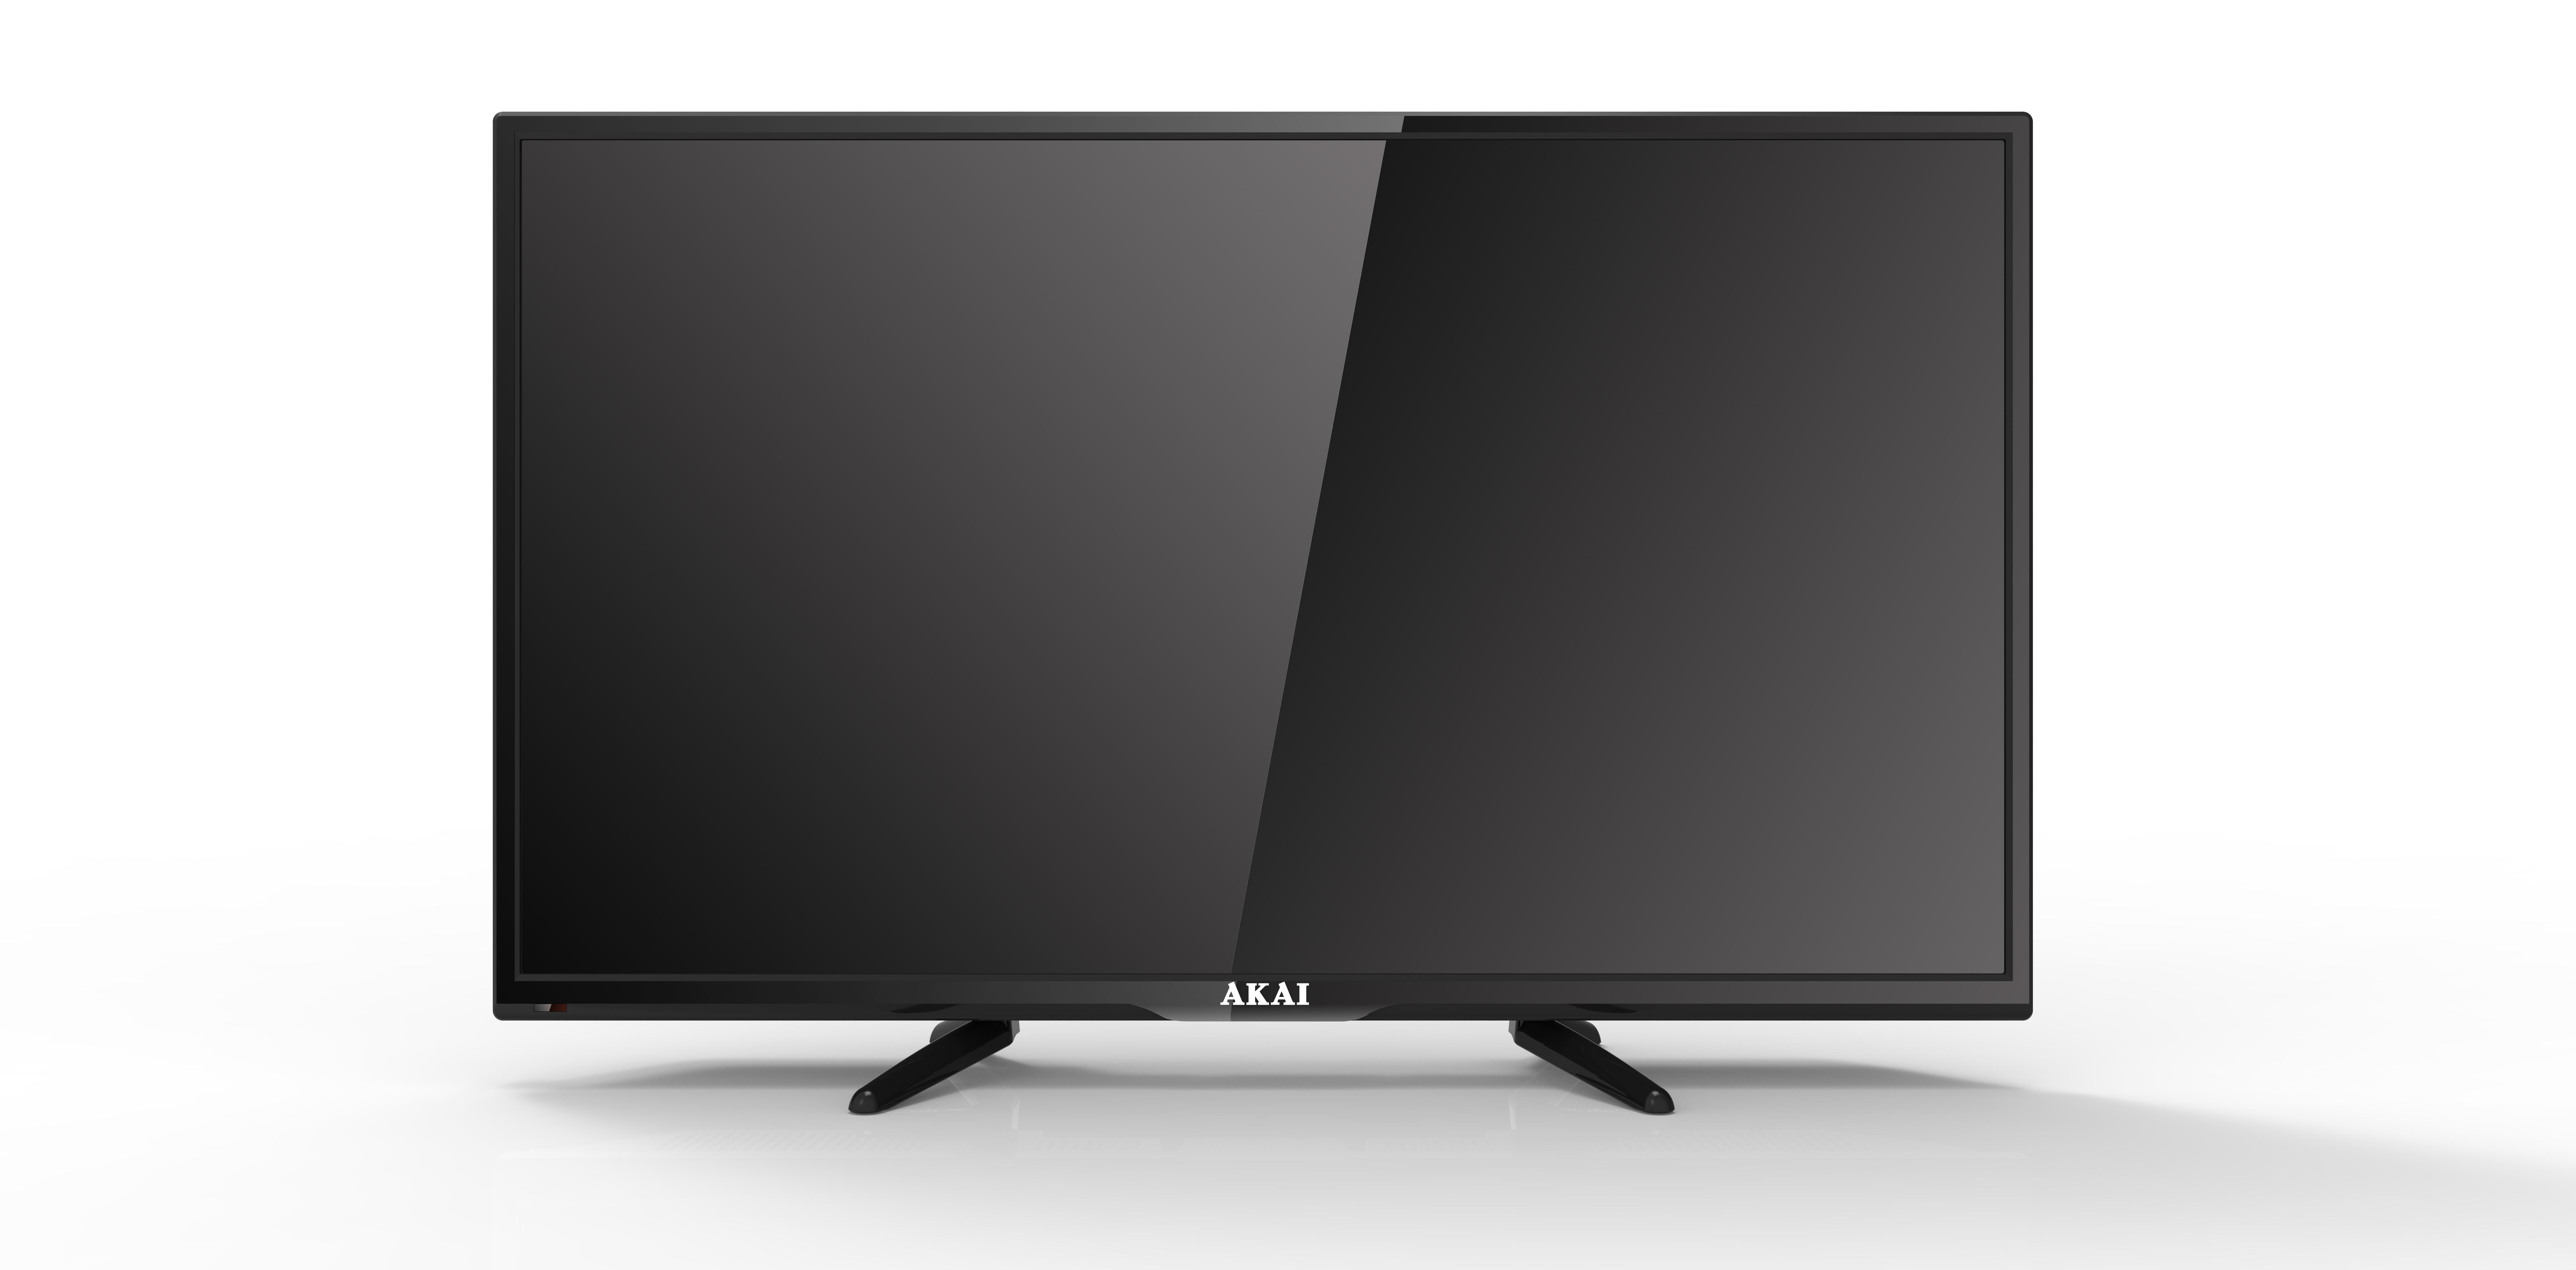 Akai AKTV225D